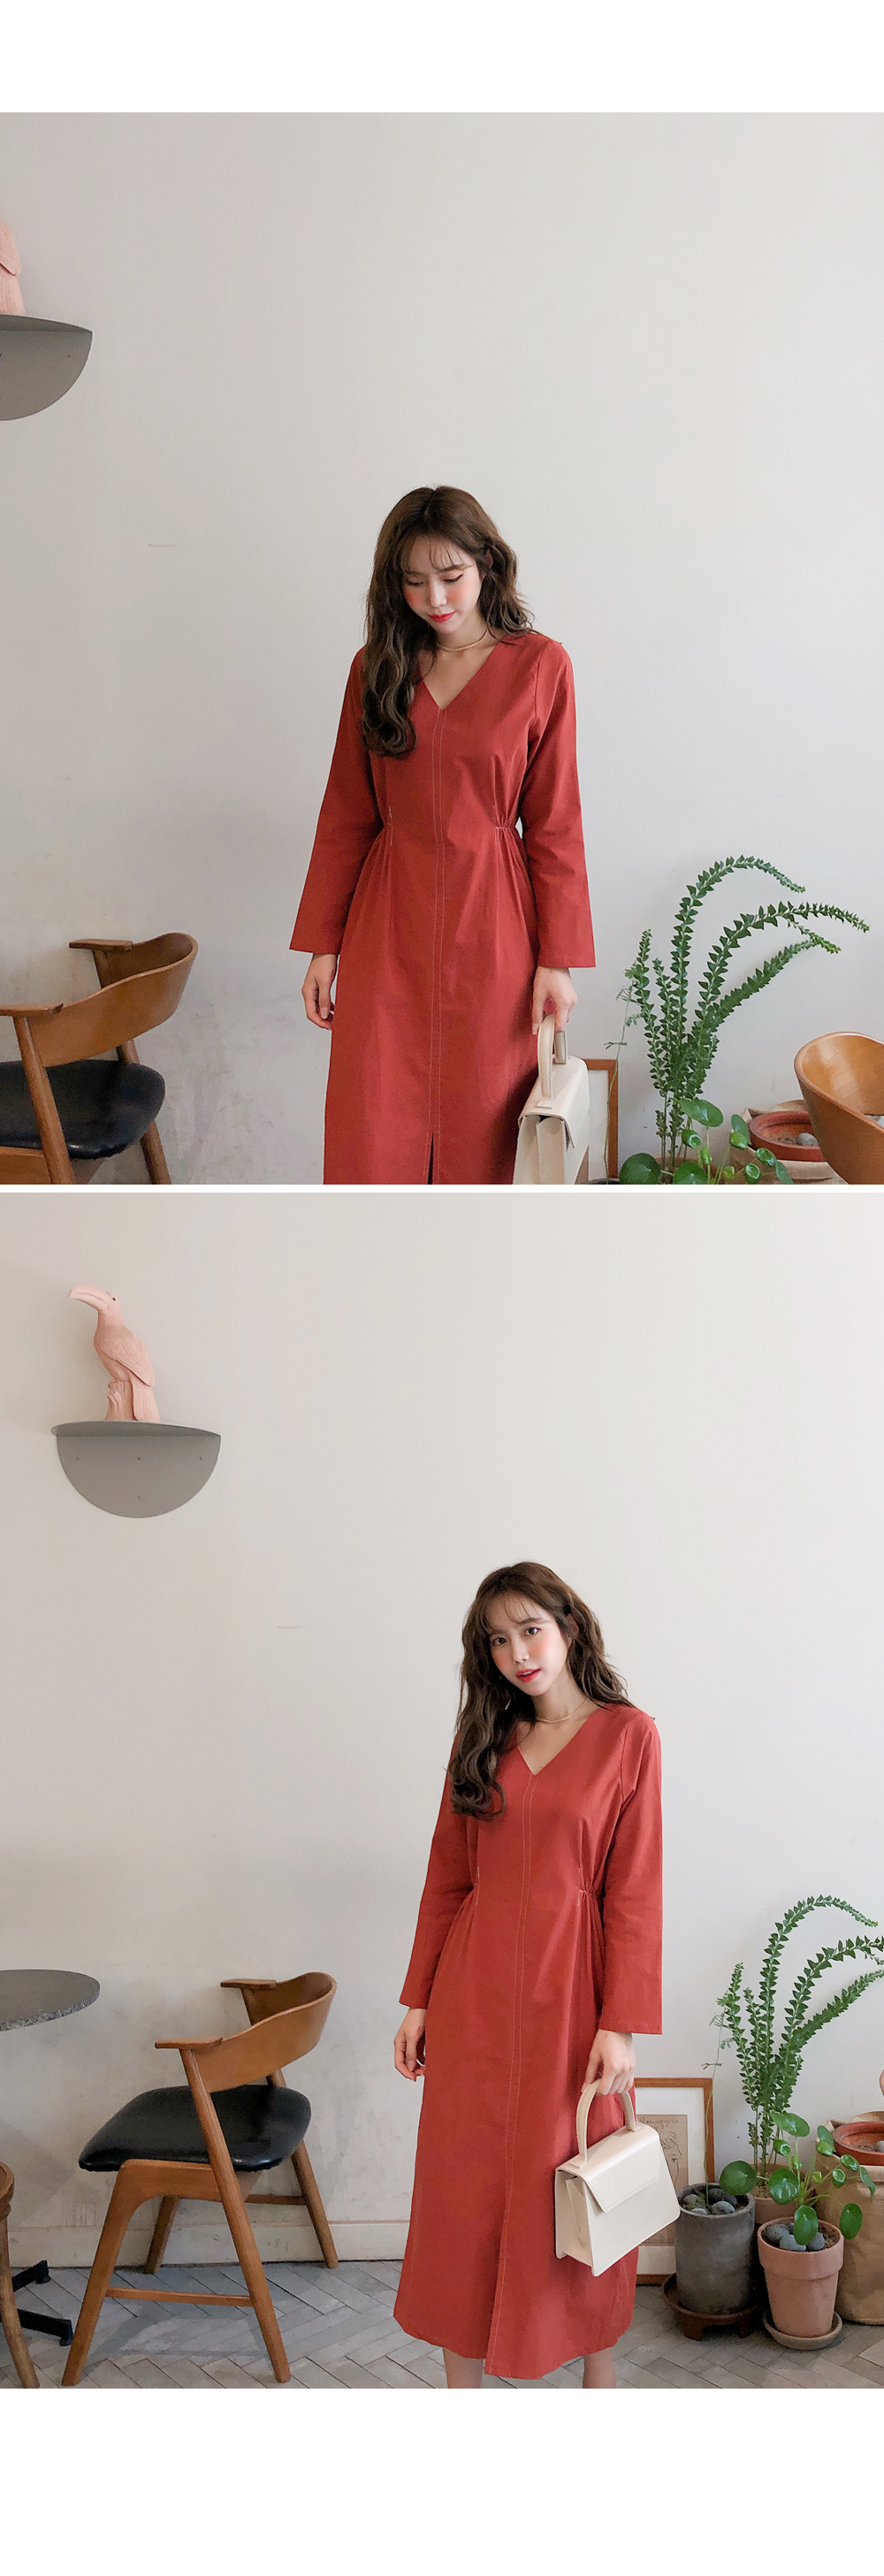 Simple basic long dress